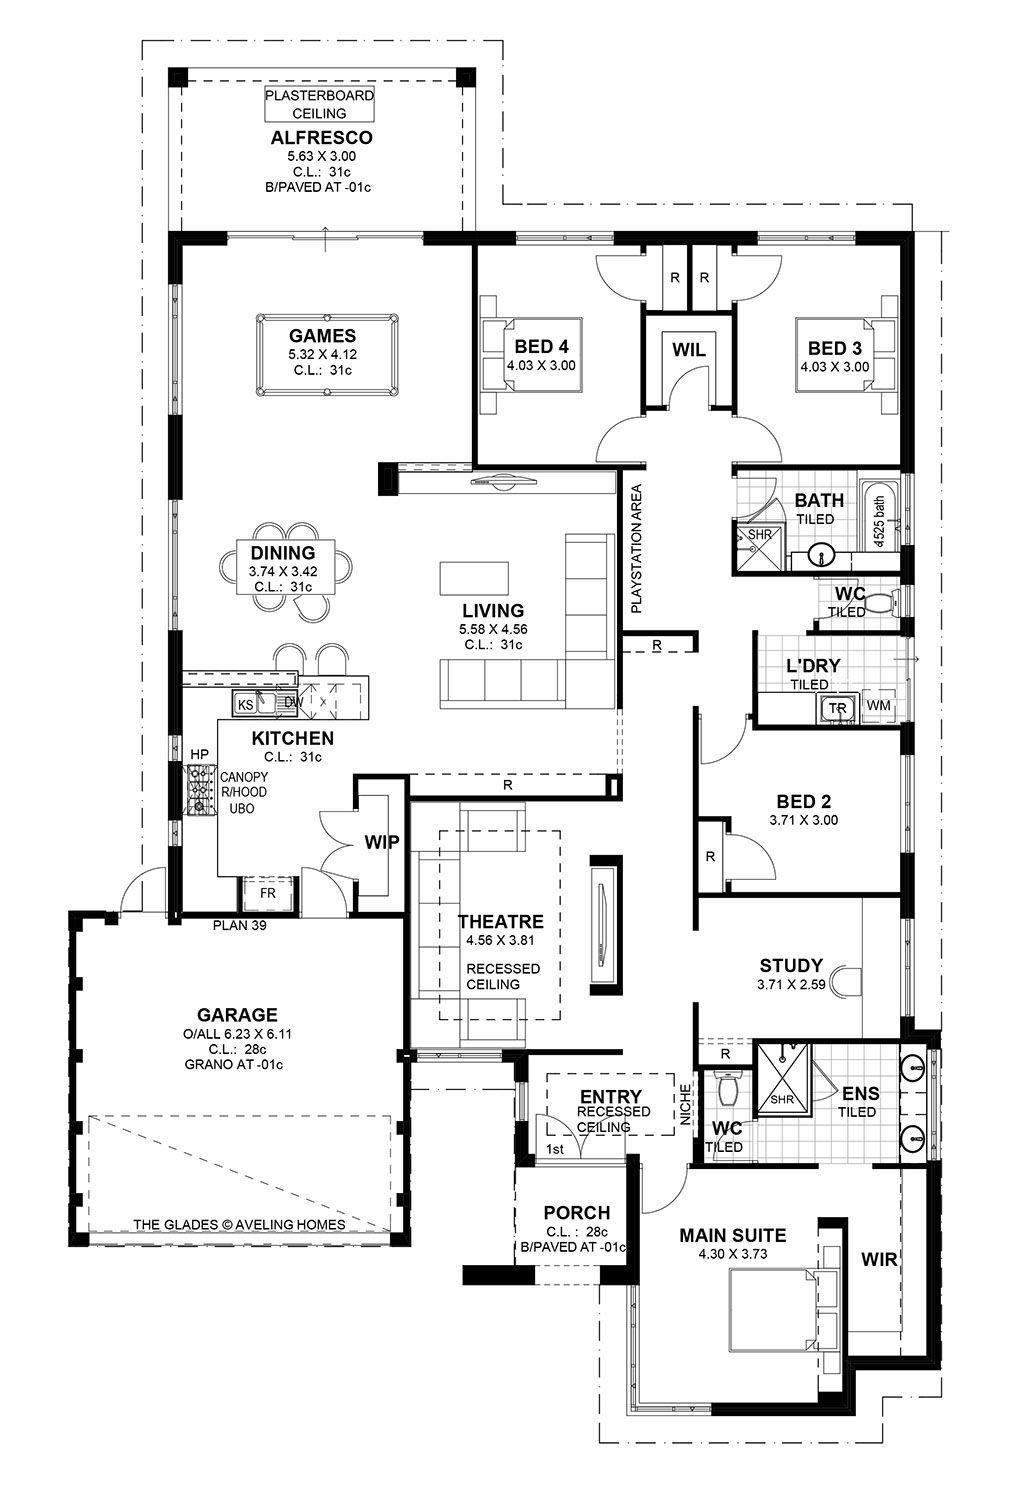 Glades S1 4 Bedroom House Plans Custom Home Plans Floor Plans